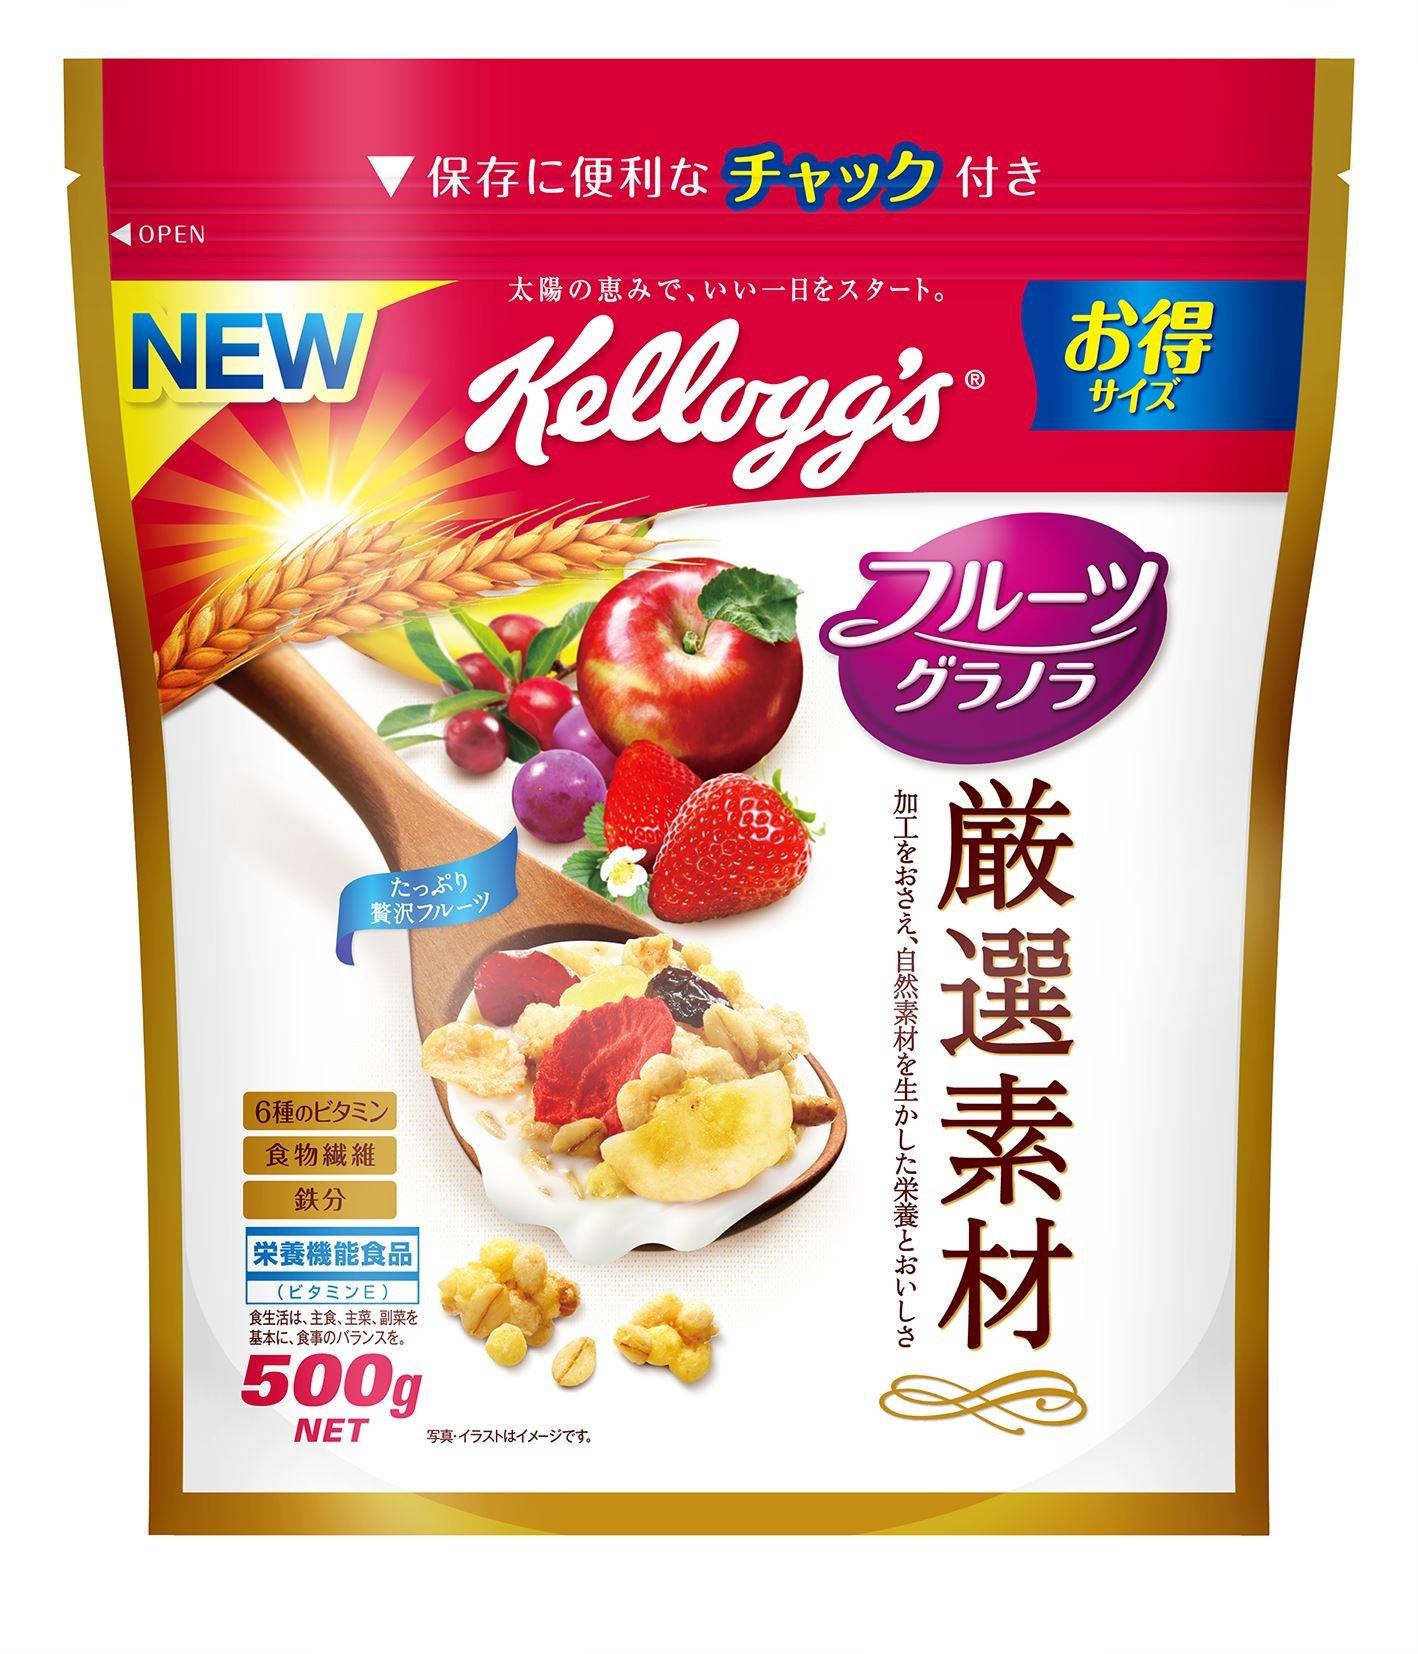 Kellogg selected materials fruit granola economical bag 500g ~ 5 bags